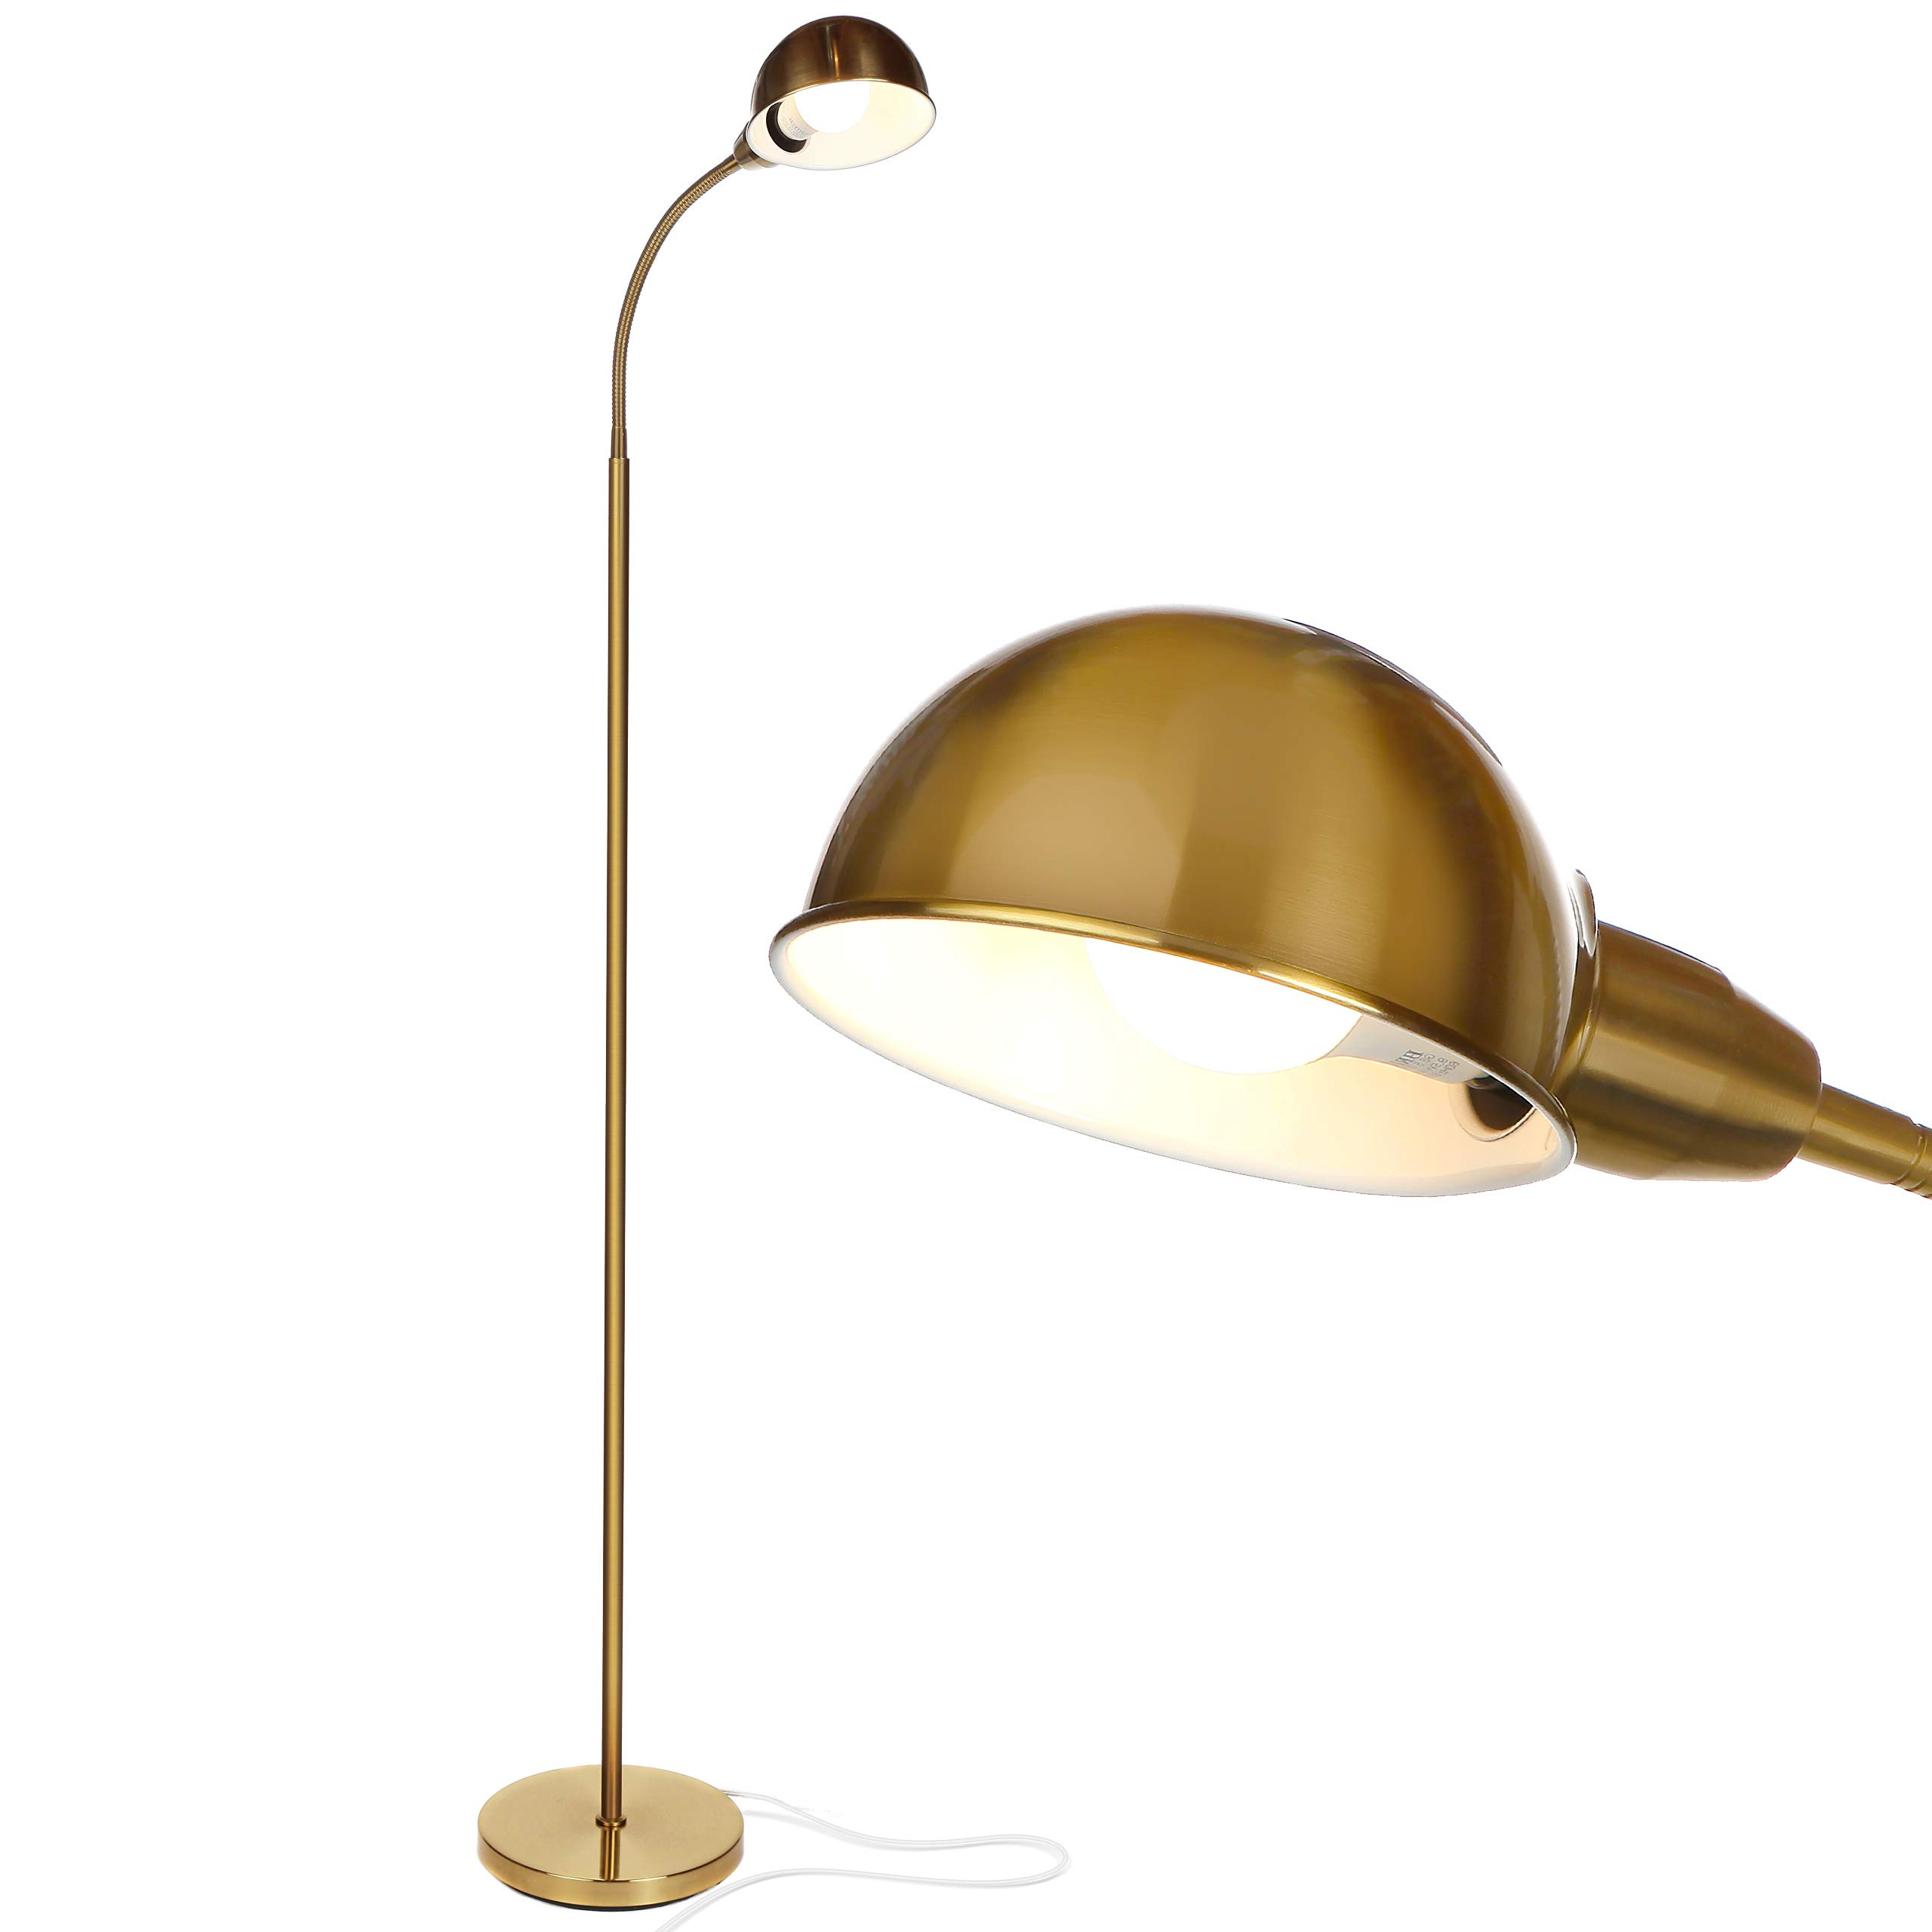 Brightech Regent - LED Reading, Craft & Task Floor Lamp - Free Standing Modern Pole Light with Adjustable Gooseneck - Tall Office Reading Light Goes Over Desk - Antique Brass